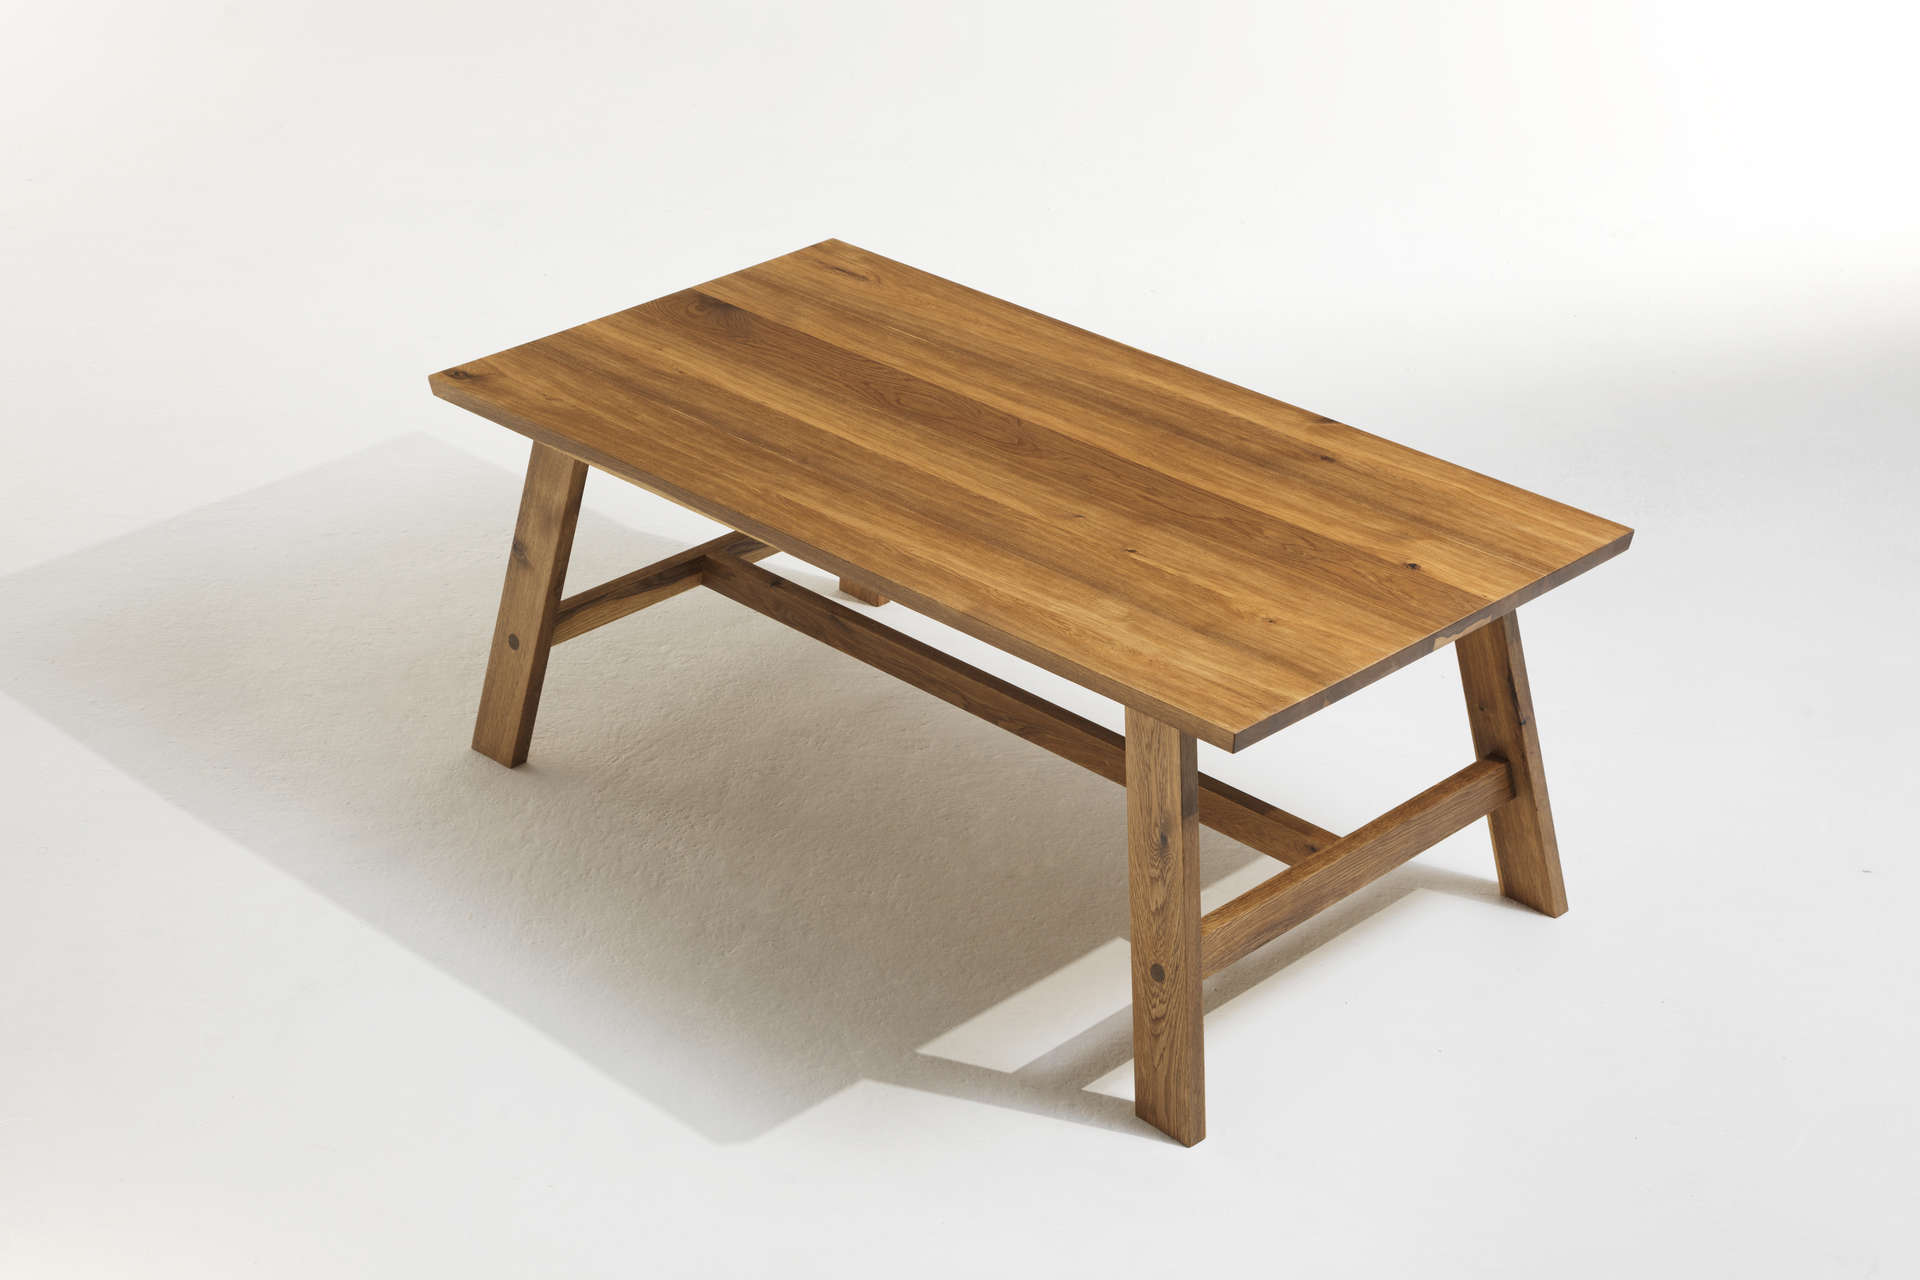 tisch massivholz eiche thomas gruber back to the woods. Black Bedroom Furniture Sets. Home Design Ideas